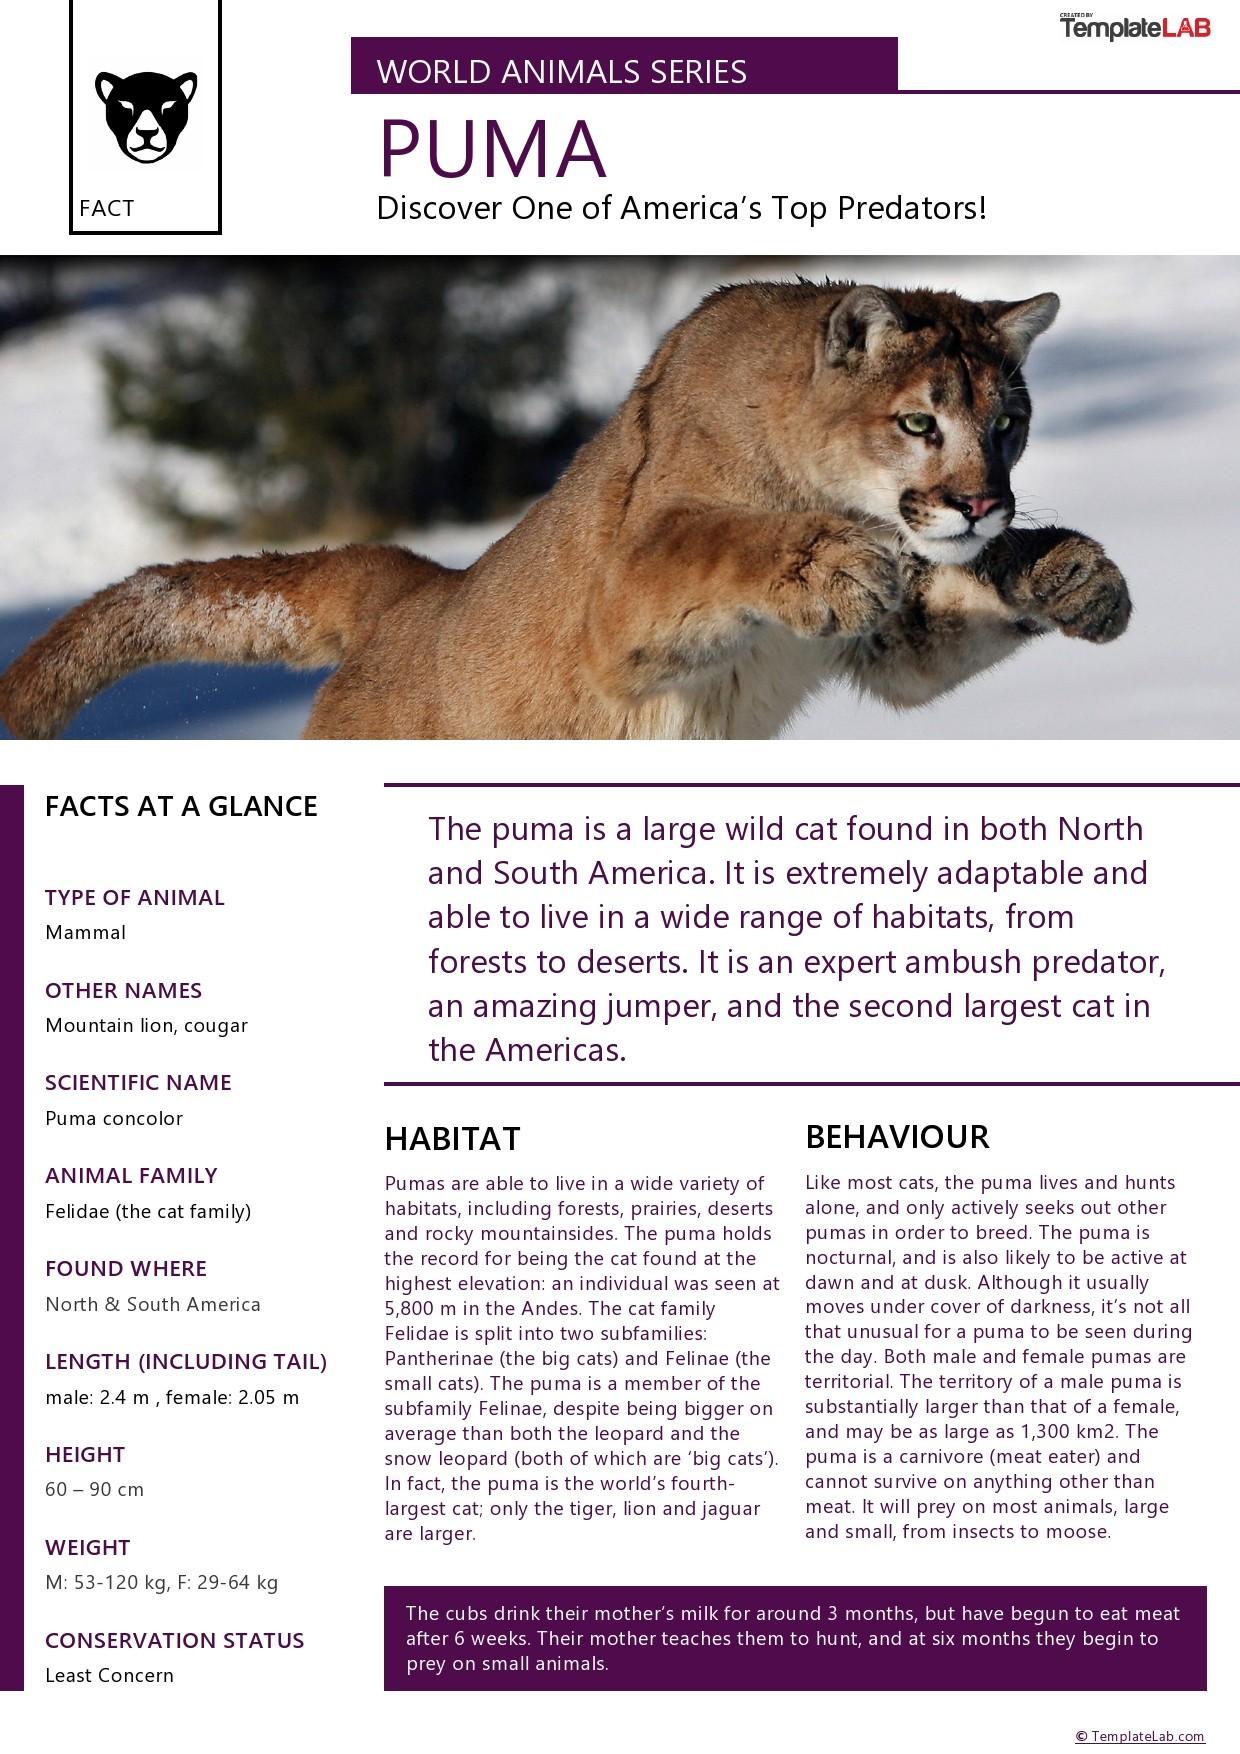 Free Animal Fact Sheet Template - TemplateLab.com